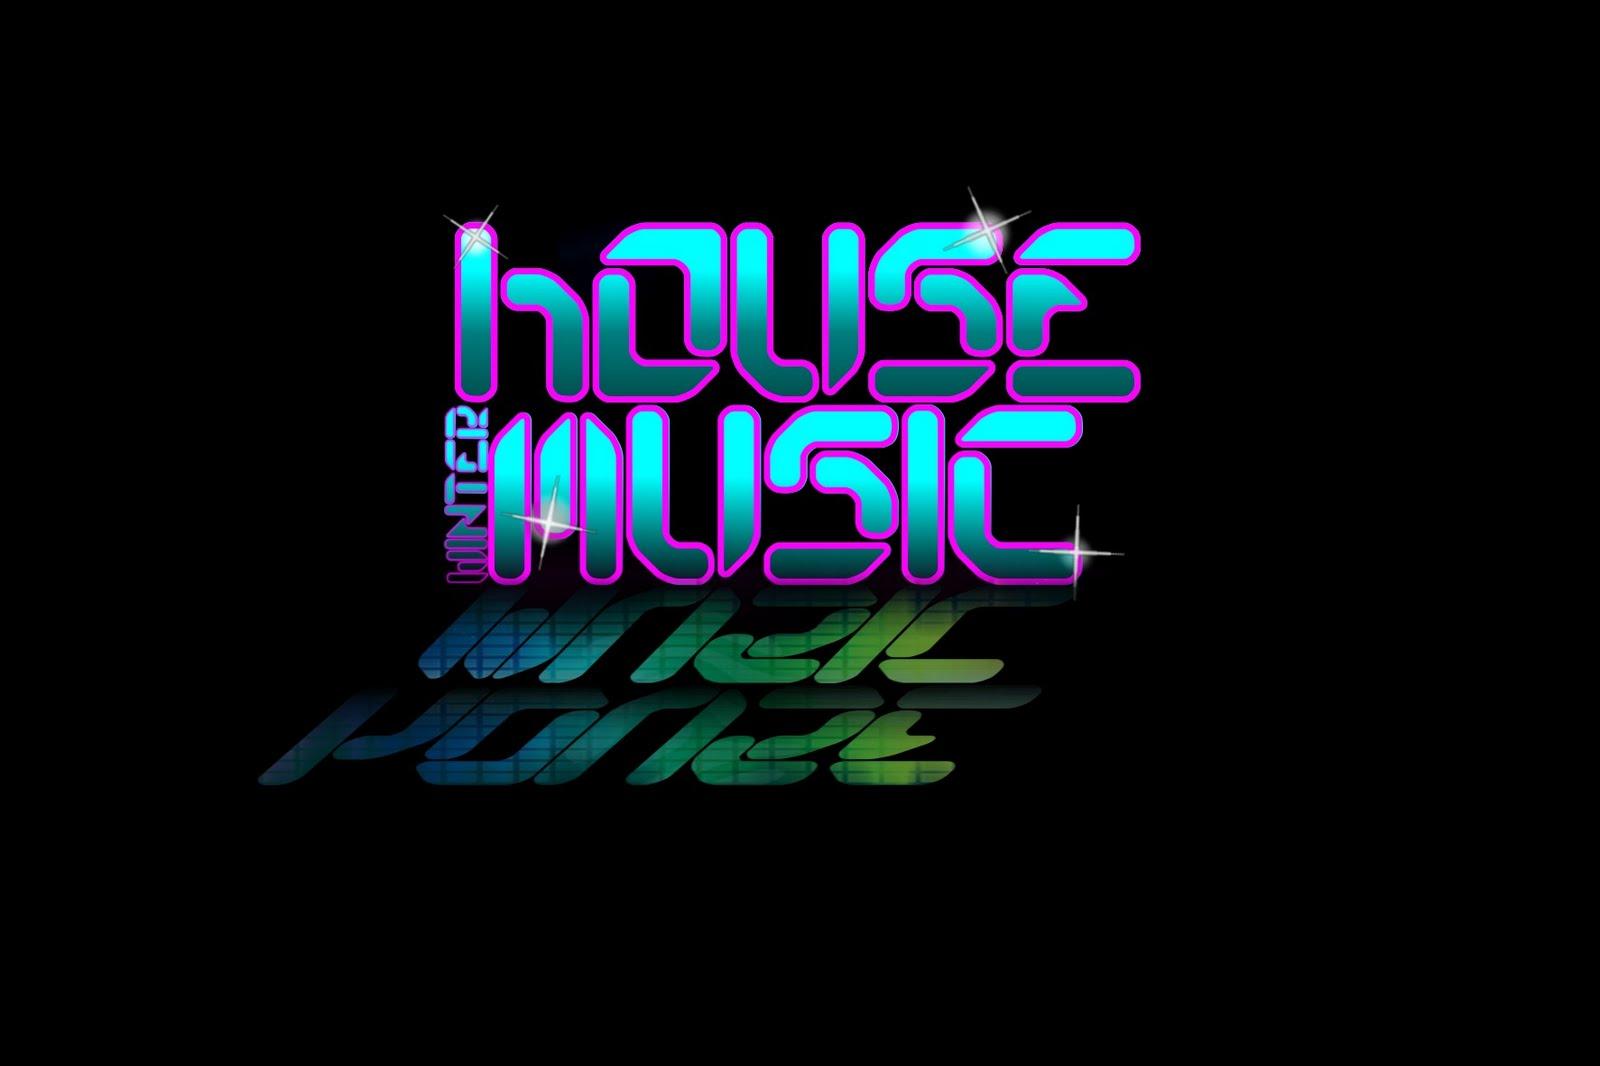 http://4.bp.blogspot.com/-o2TtS-EiH78/TuDZ2DlV0qI/AAAAAAAAAGE/JhdbVz3CXl0/s1600/House_music%2B%25281%2529.jpg